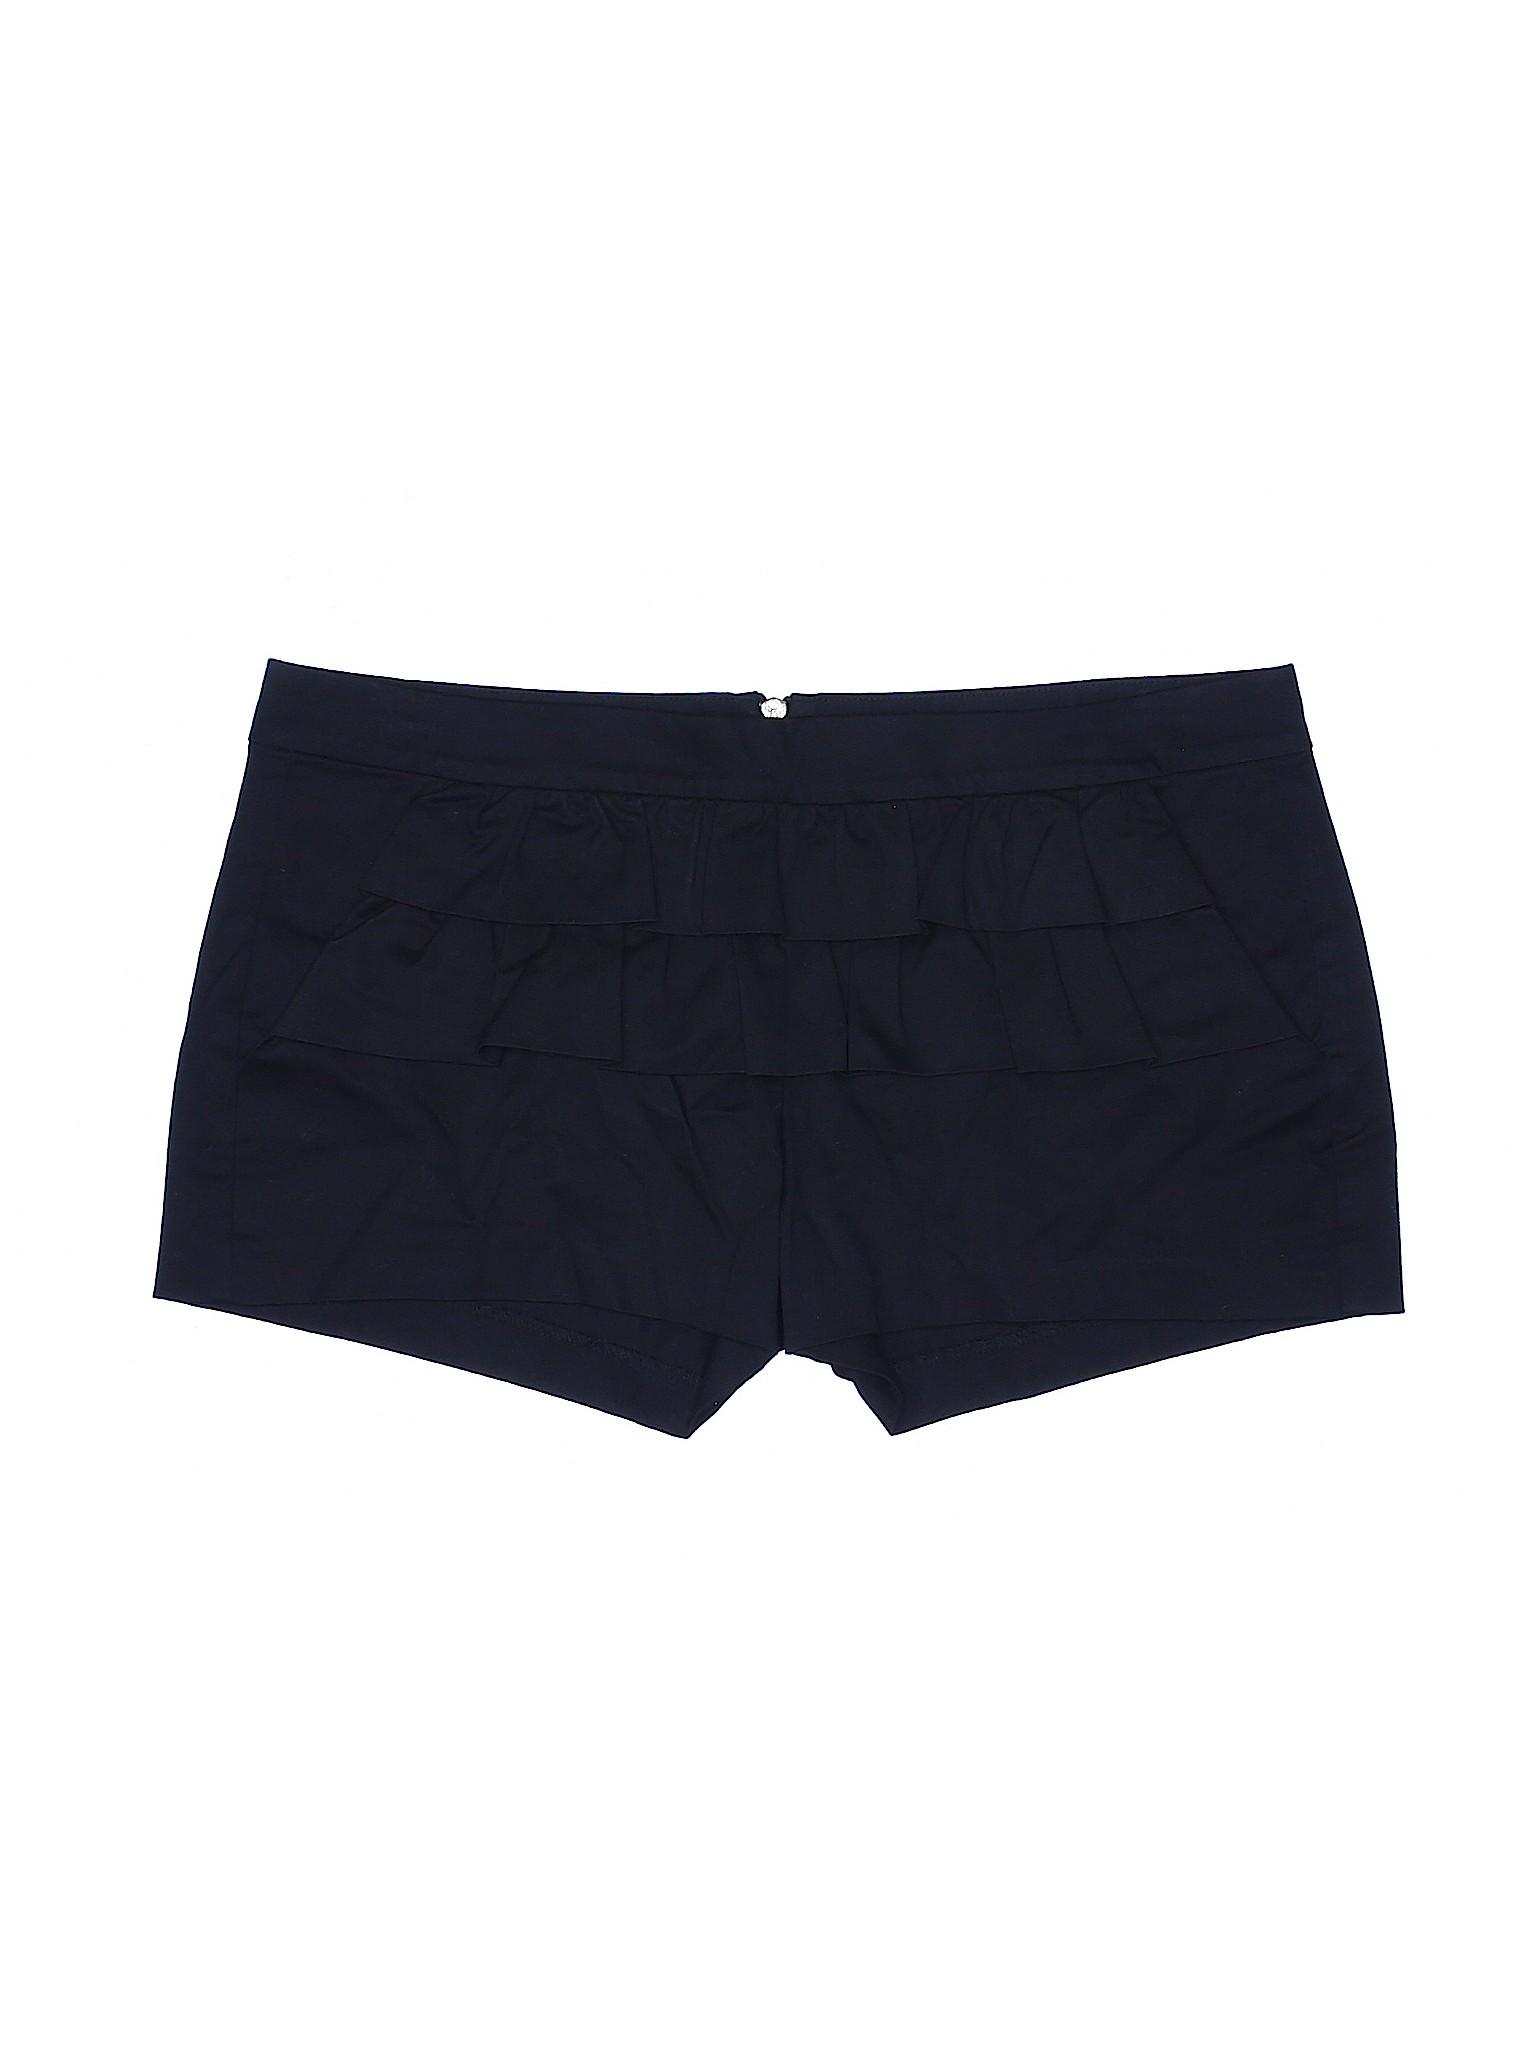 Kira winter Kira Boutique Shorts Kira Plastinina winter Shorts winter Boutique Boutique Plastinina zIn1R61x